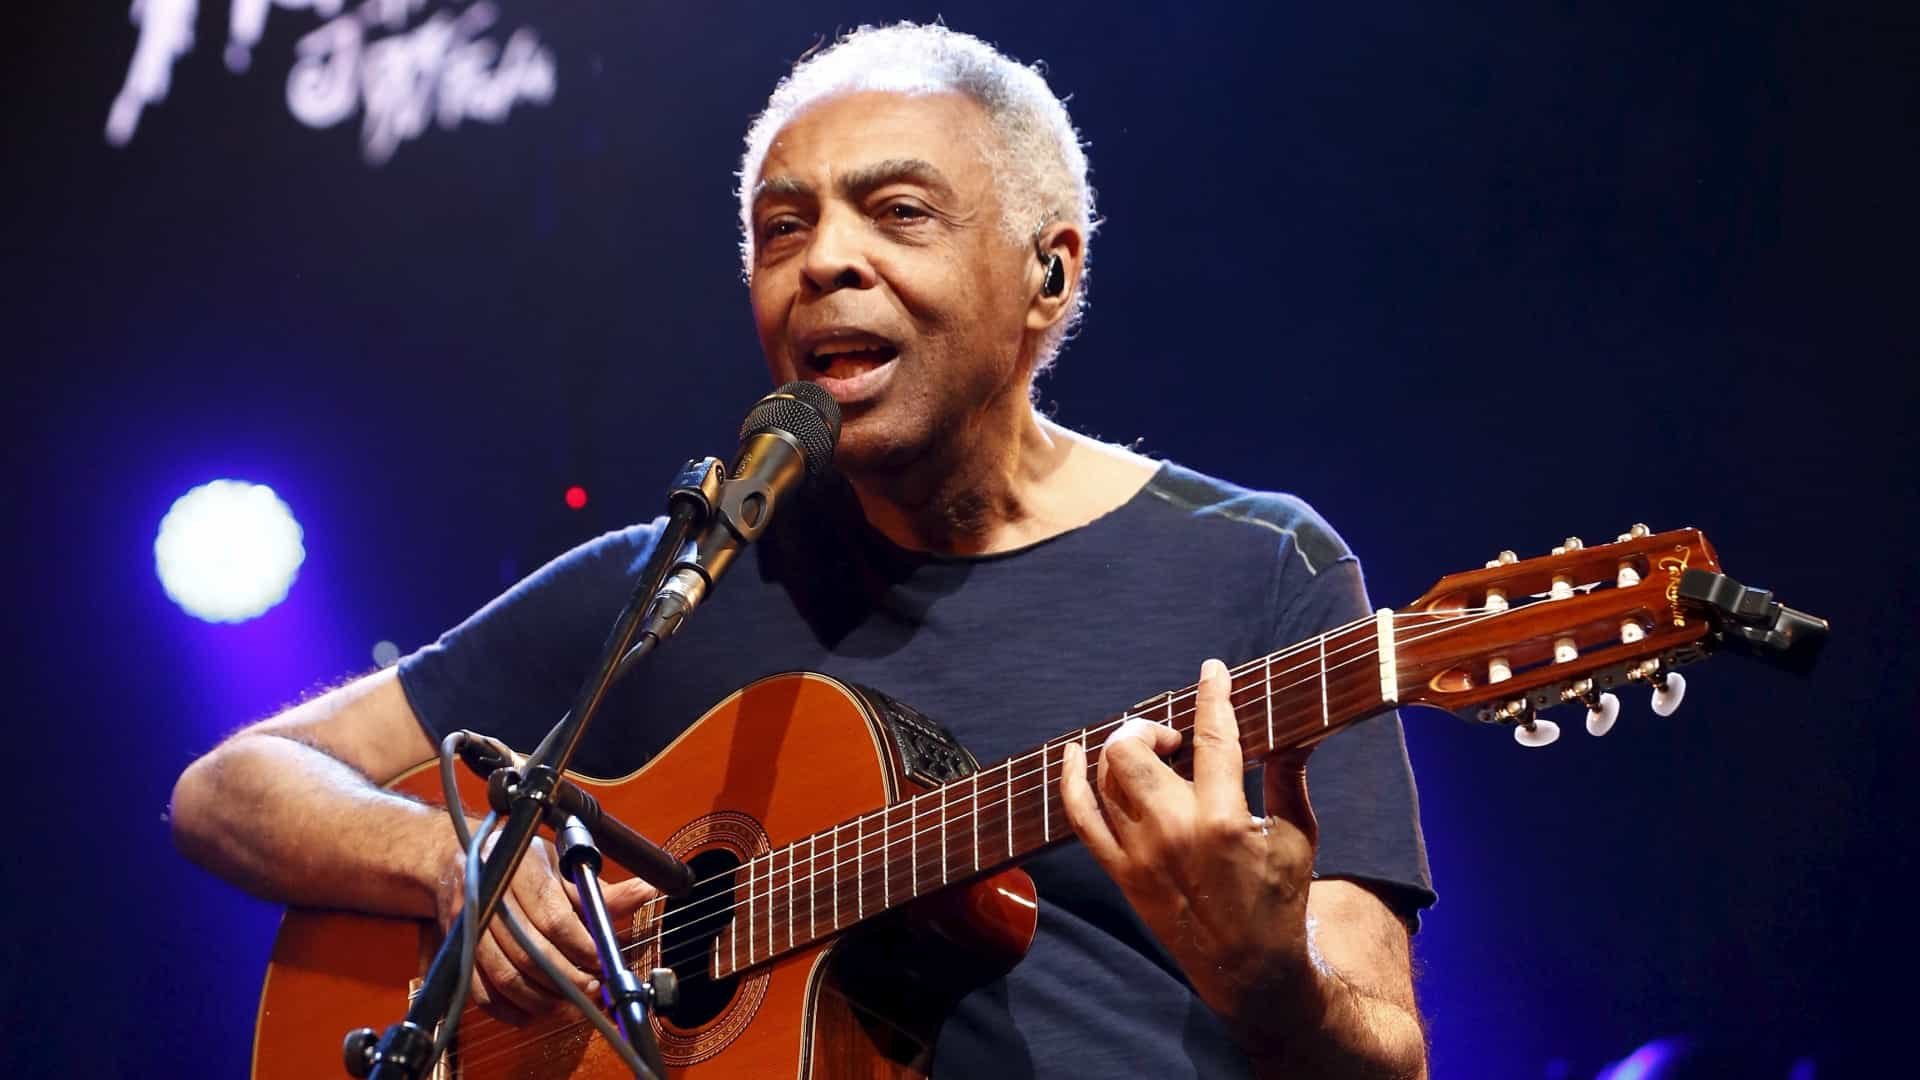 26 de junho: aniversário de Gilberto Gil